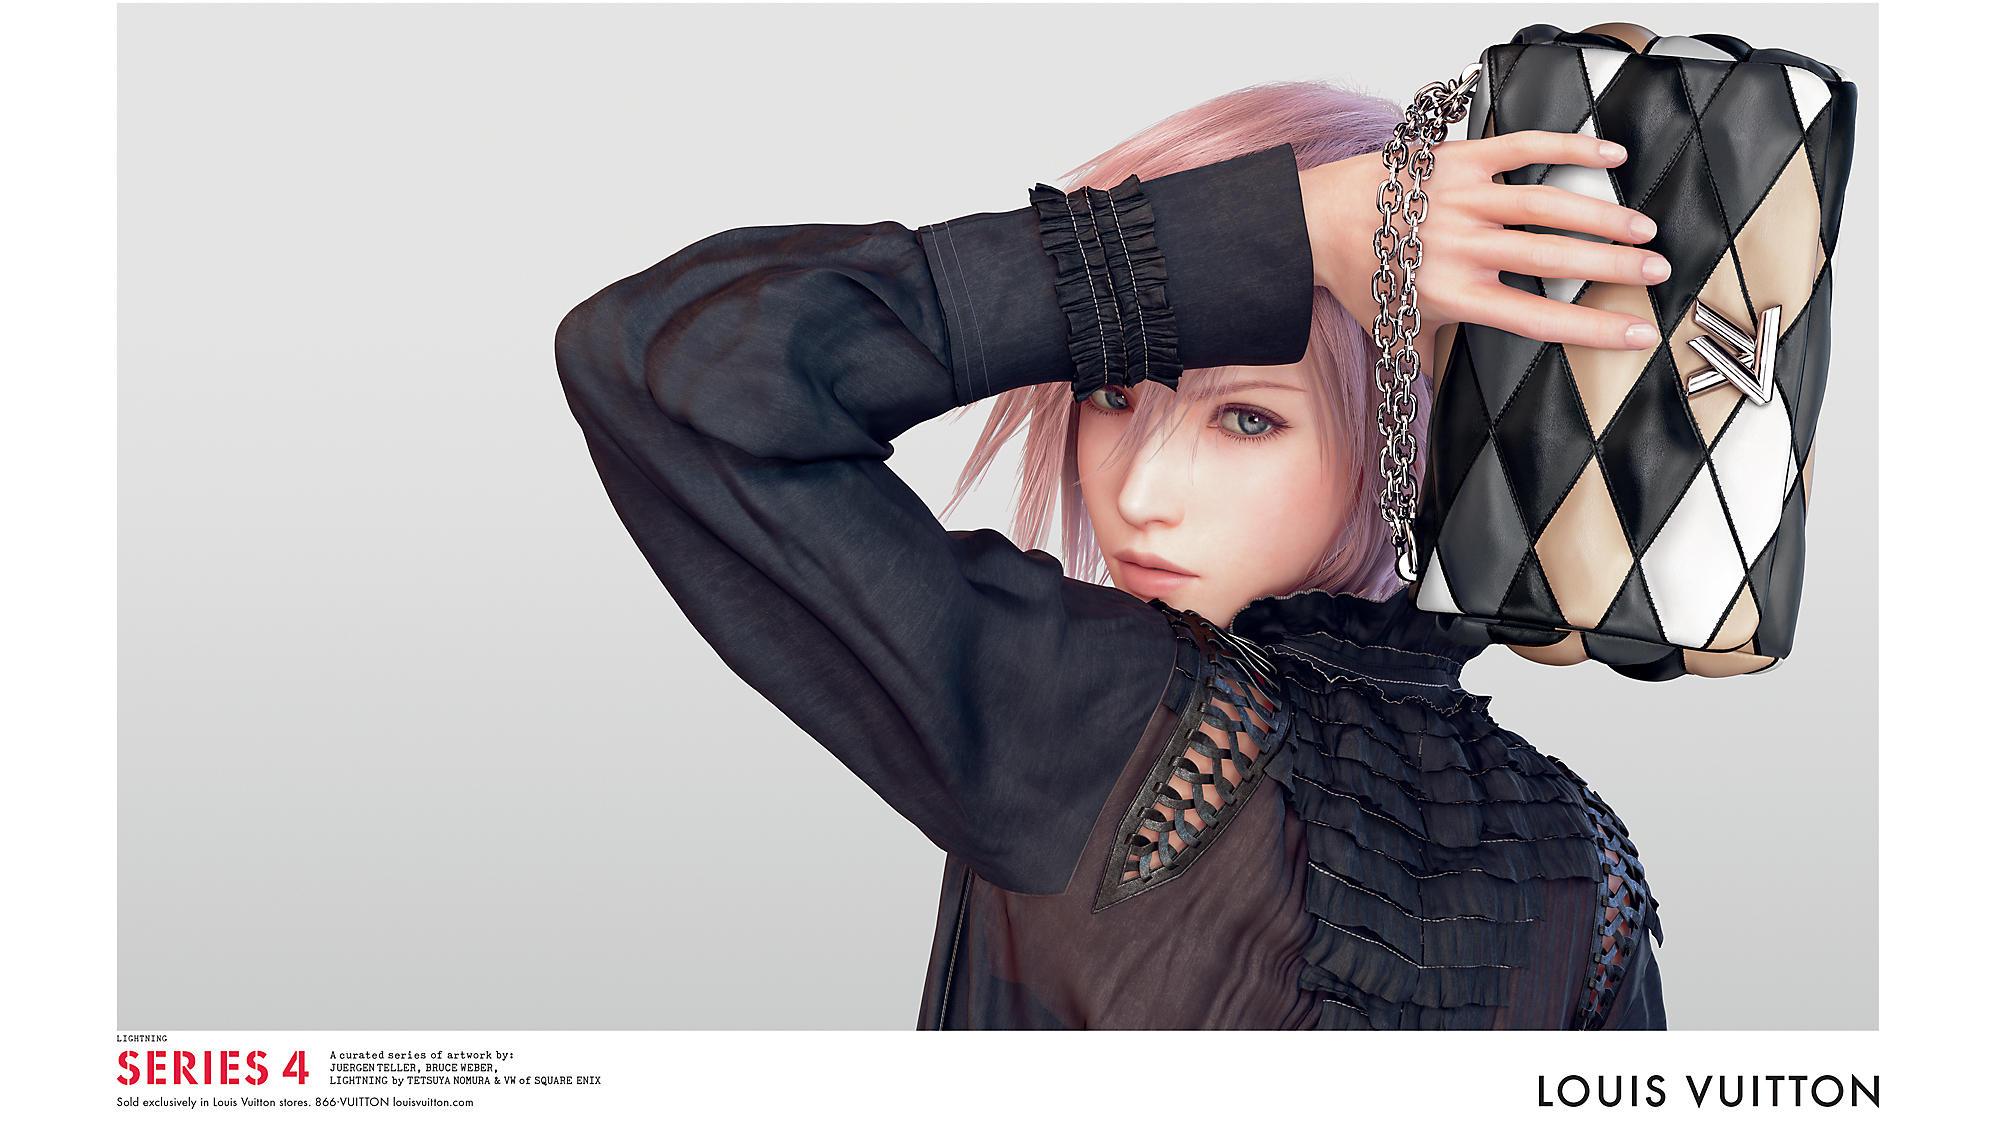 Louis Vuitton Series 4 + Final Fantasy XIII